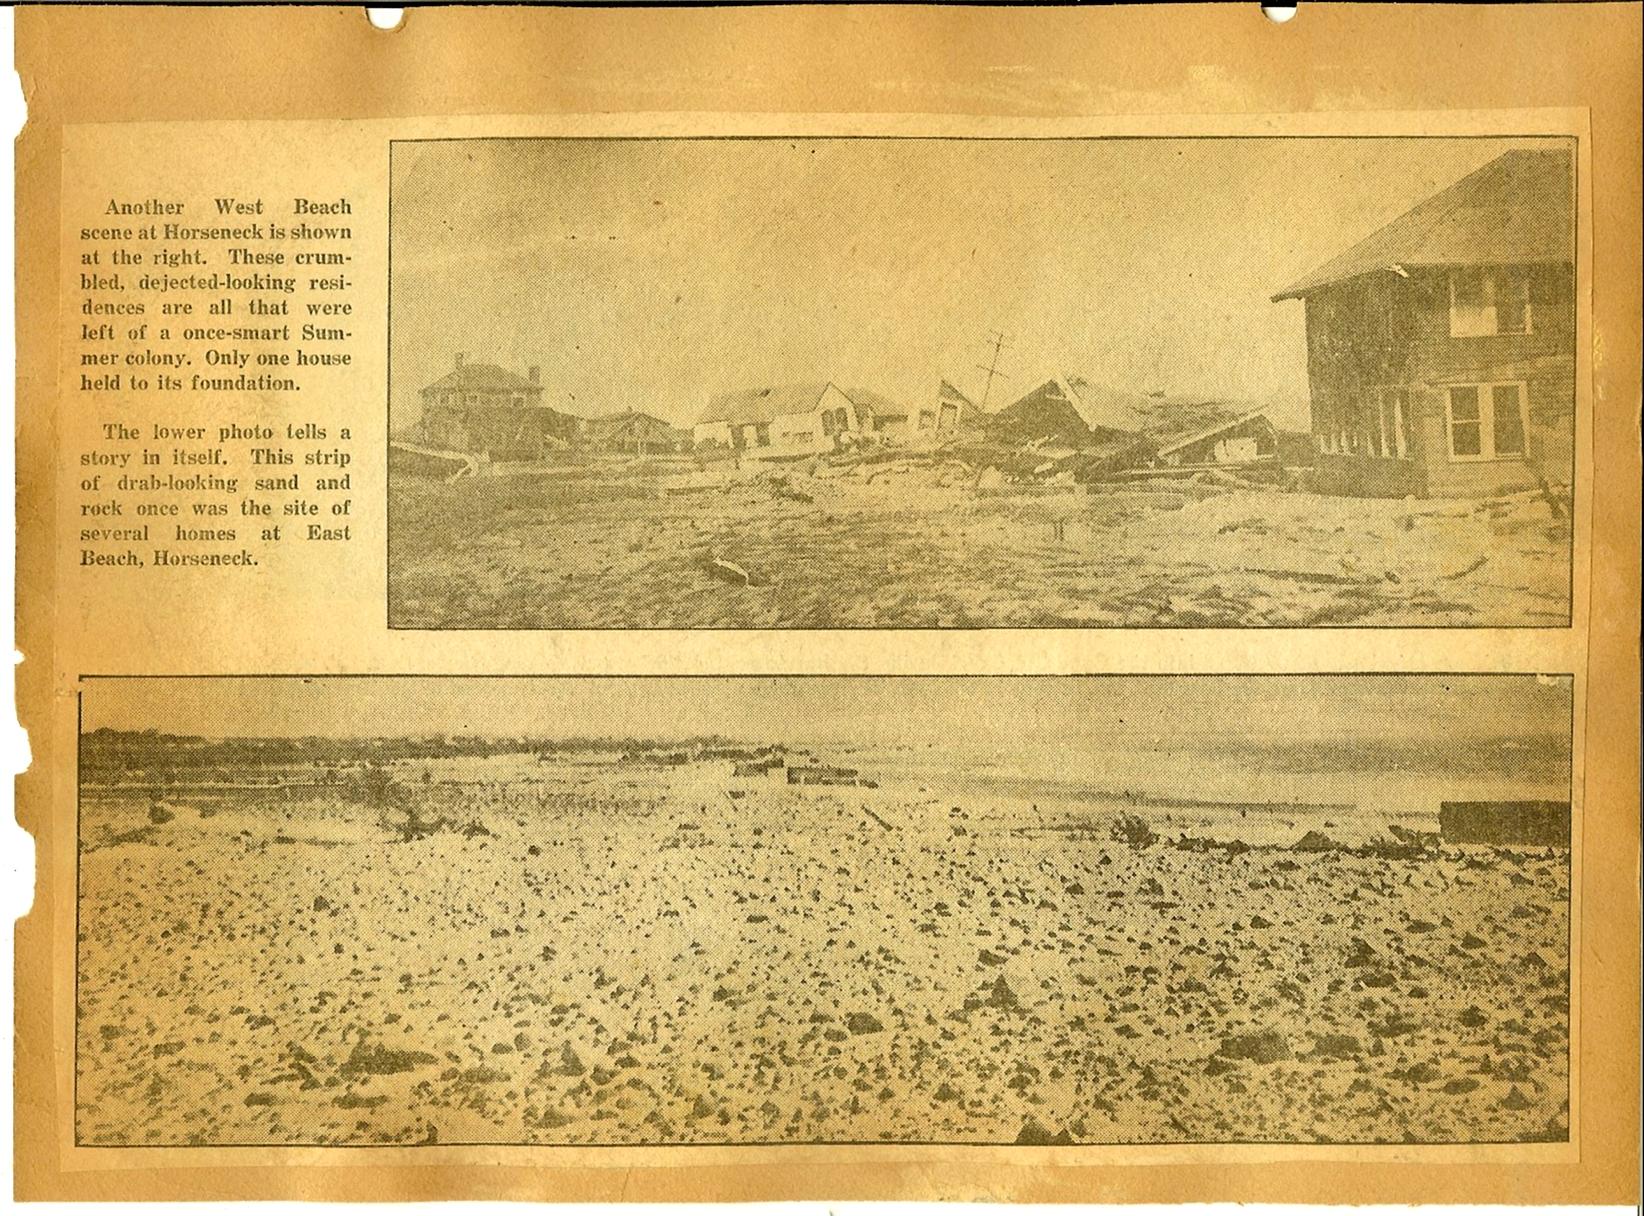 The 1938 Hurricane photos p33